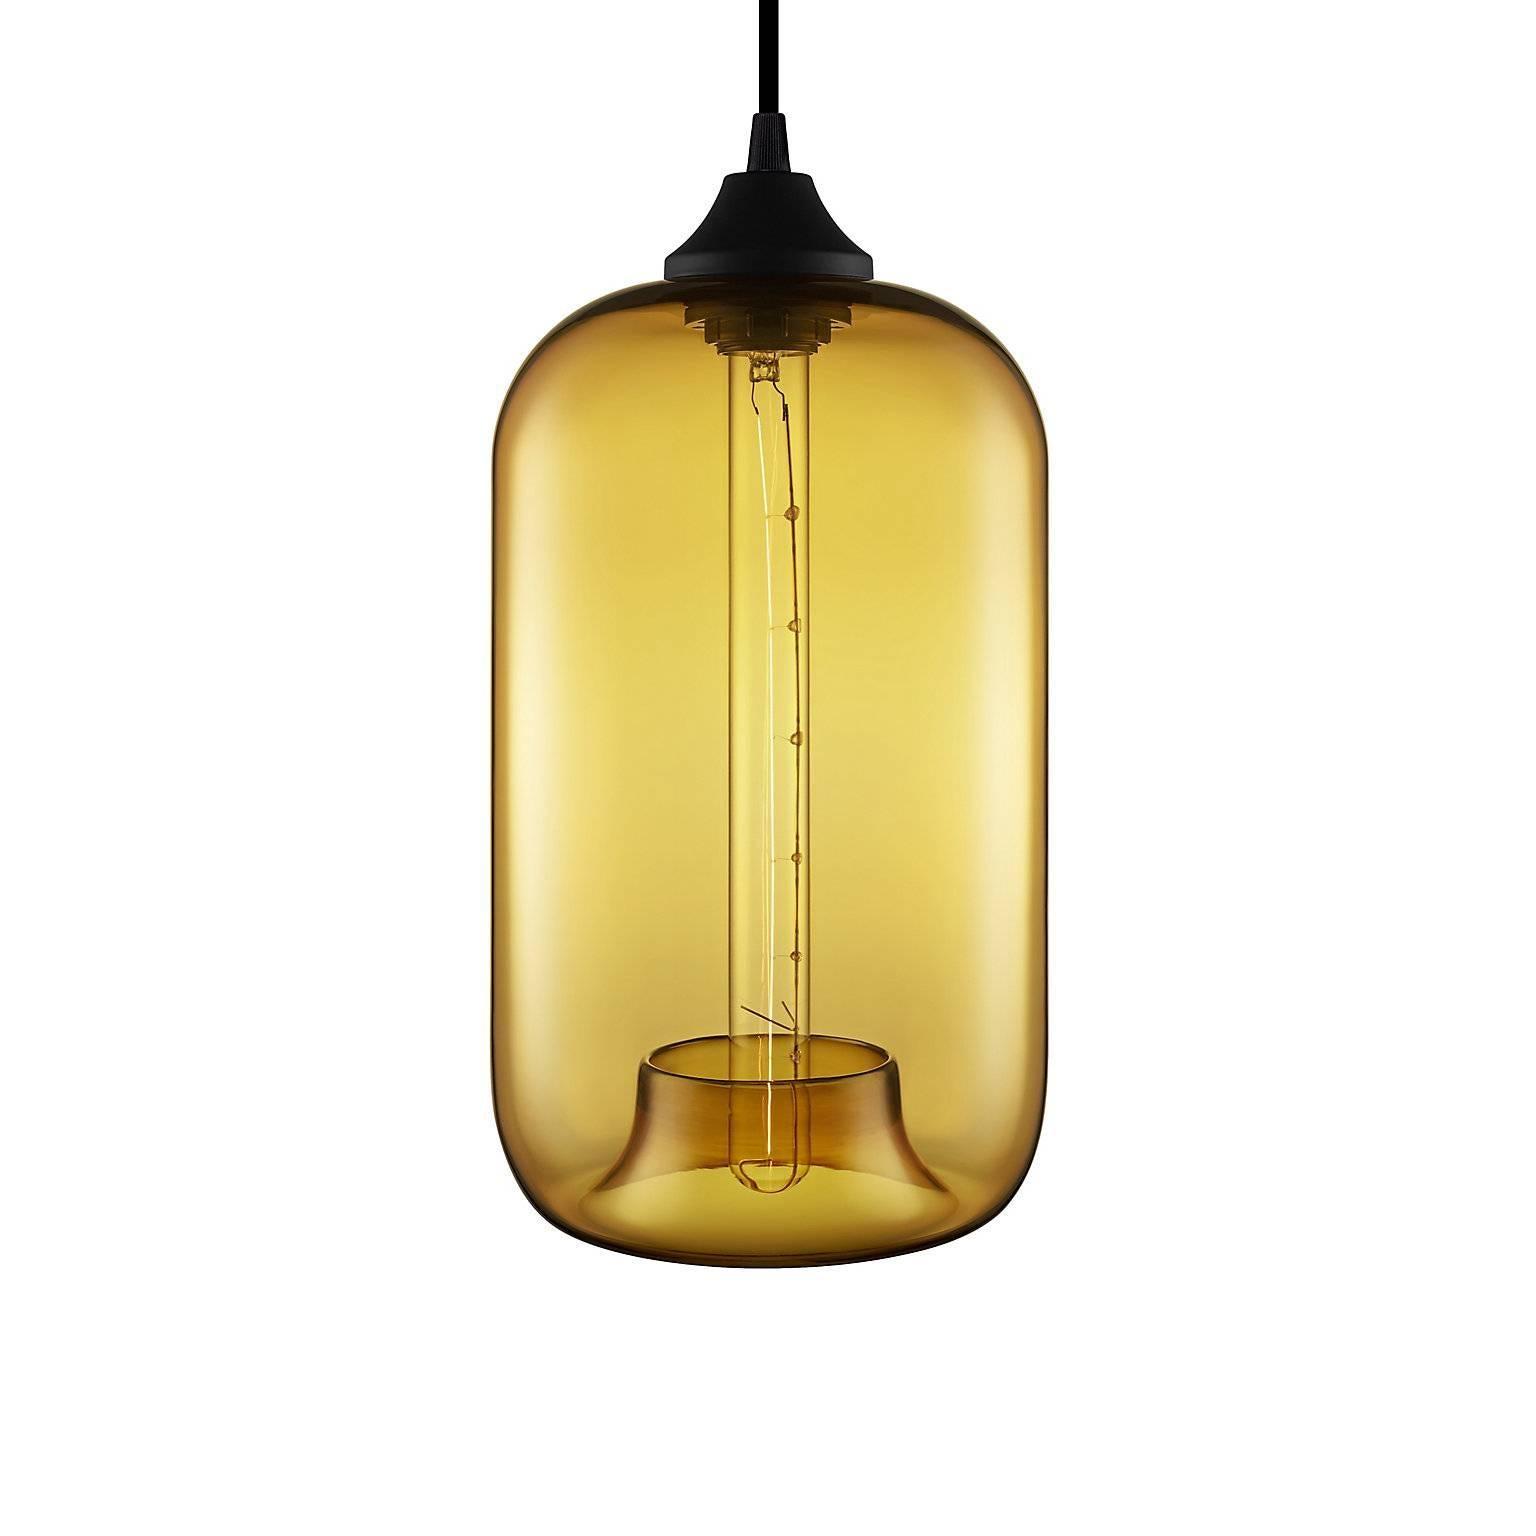 Pod Amber Handblown Modern Glass Pendant Light, Made in the USA